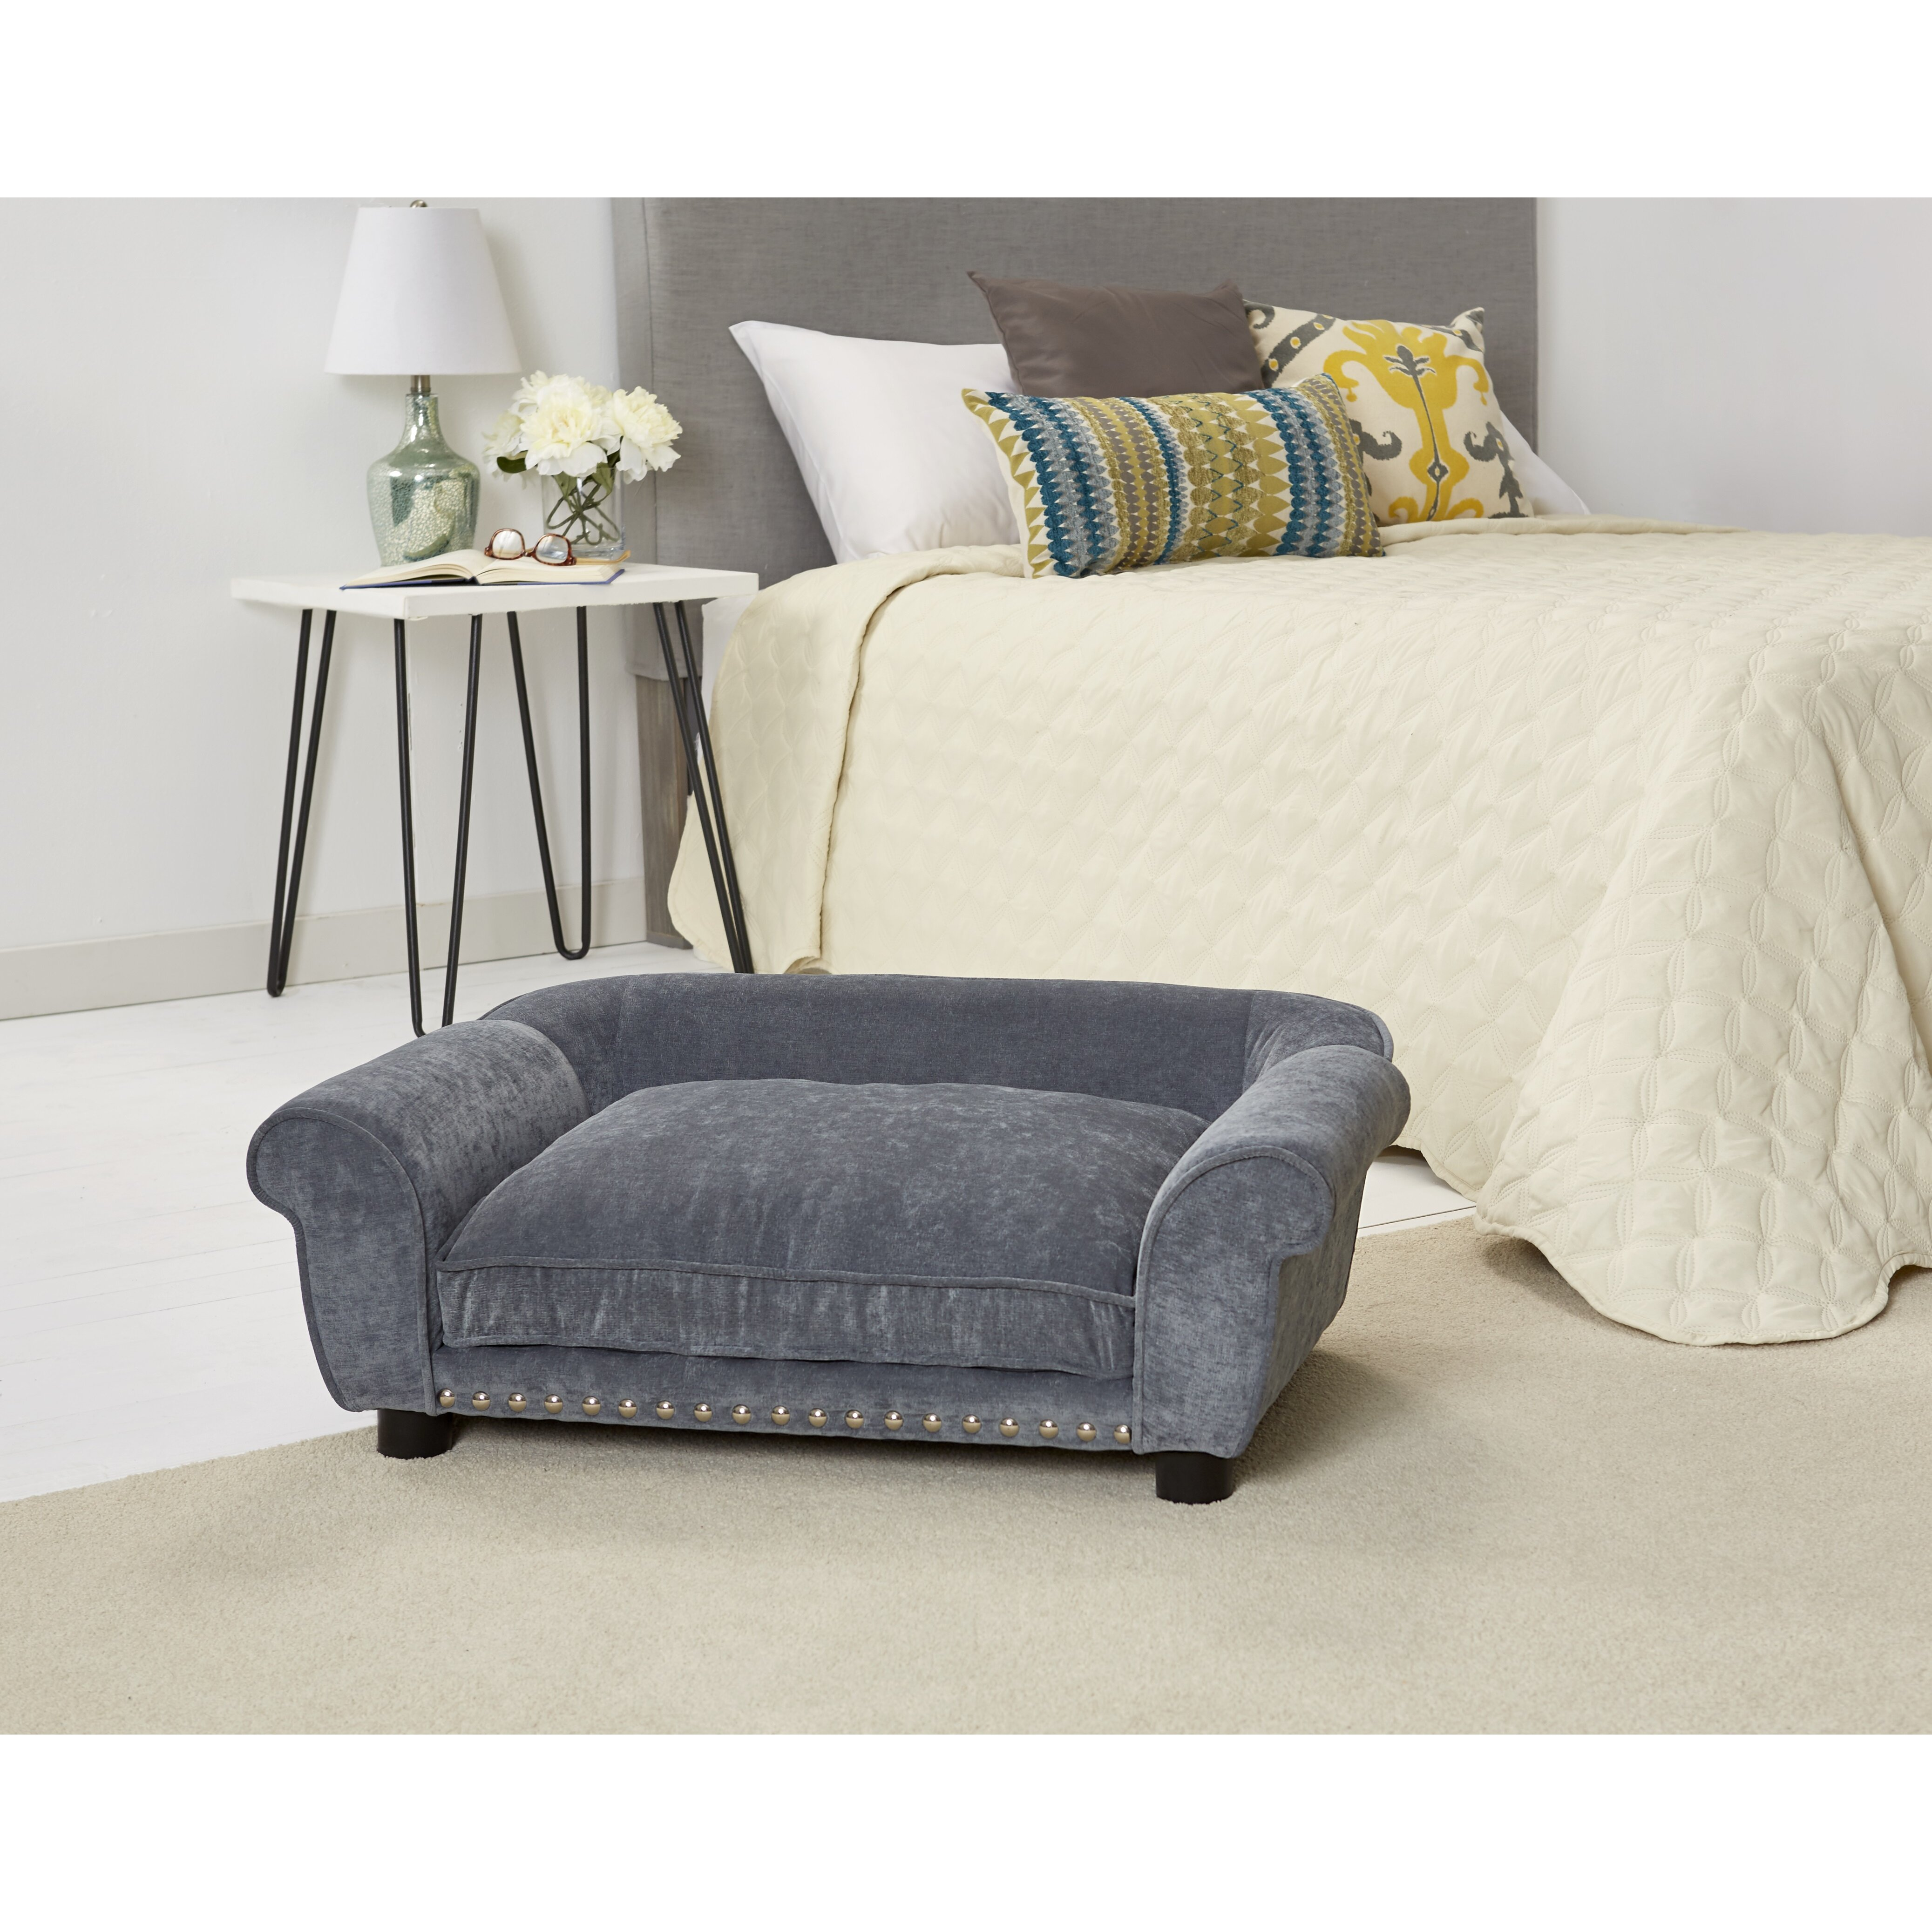 Enchanted home pet dreamcatcher velvet dog sofa with for Sofa dreams